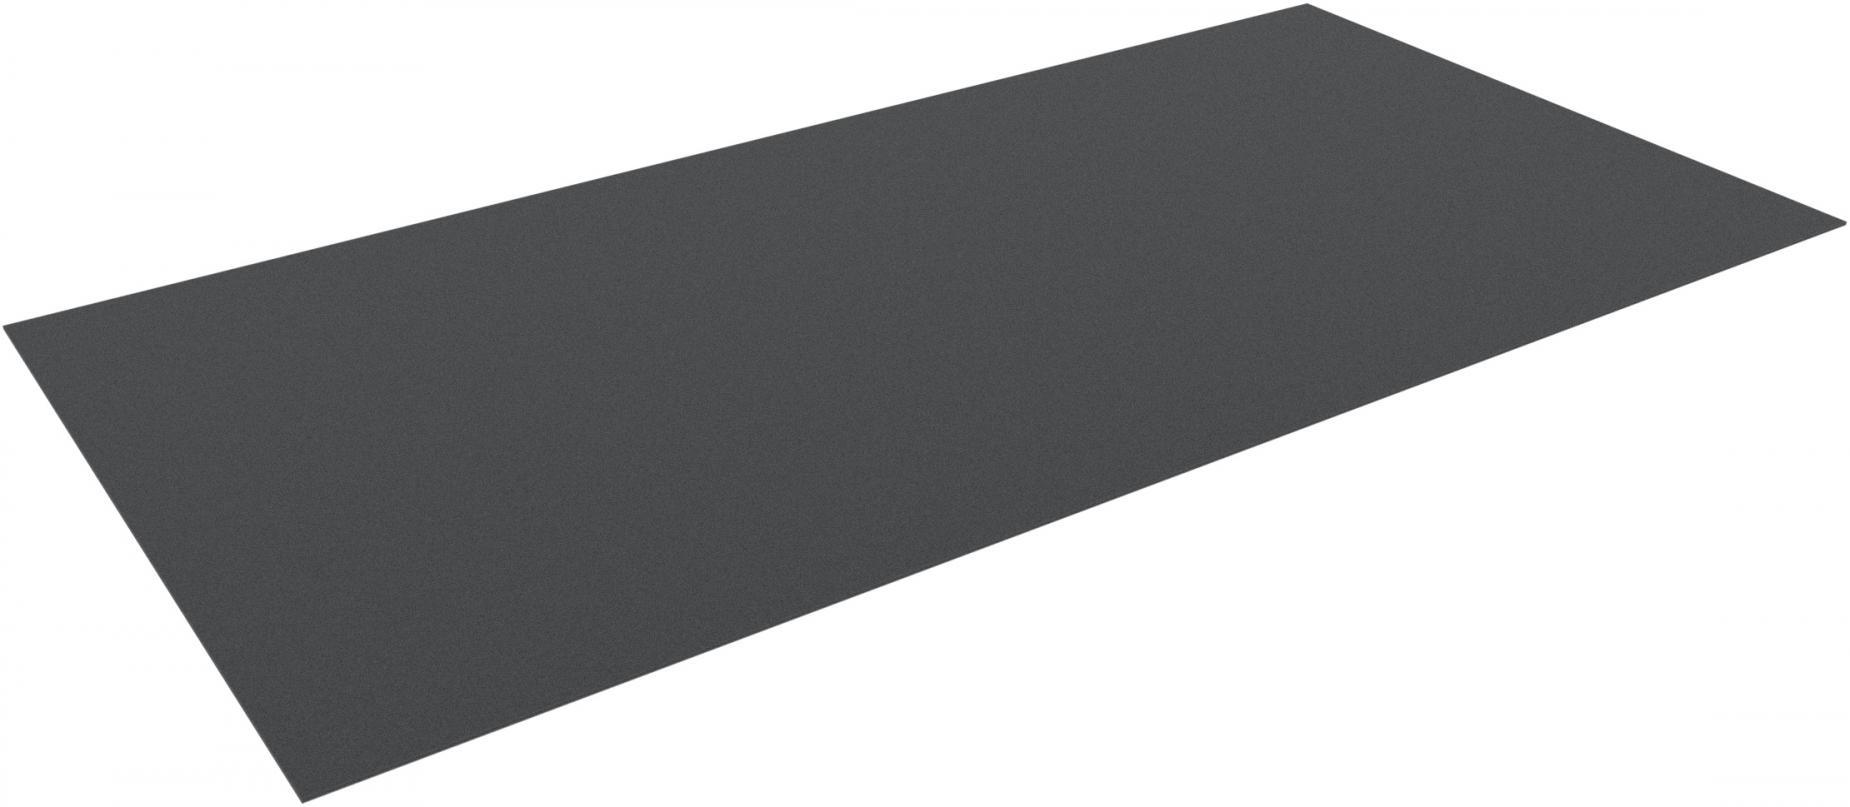 2000 mm x 1000 mm x 5 mm foam sheet